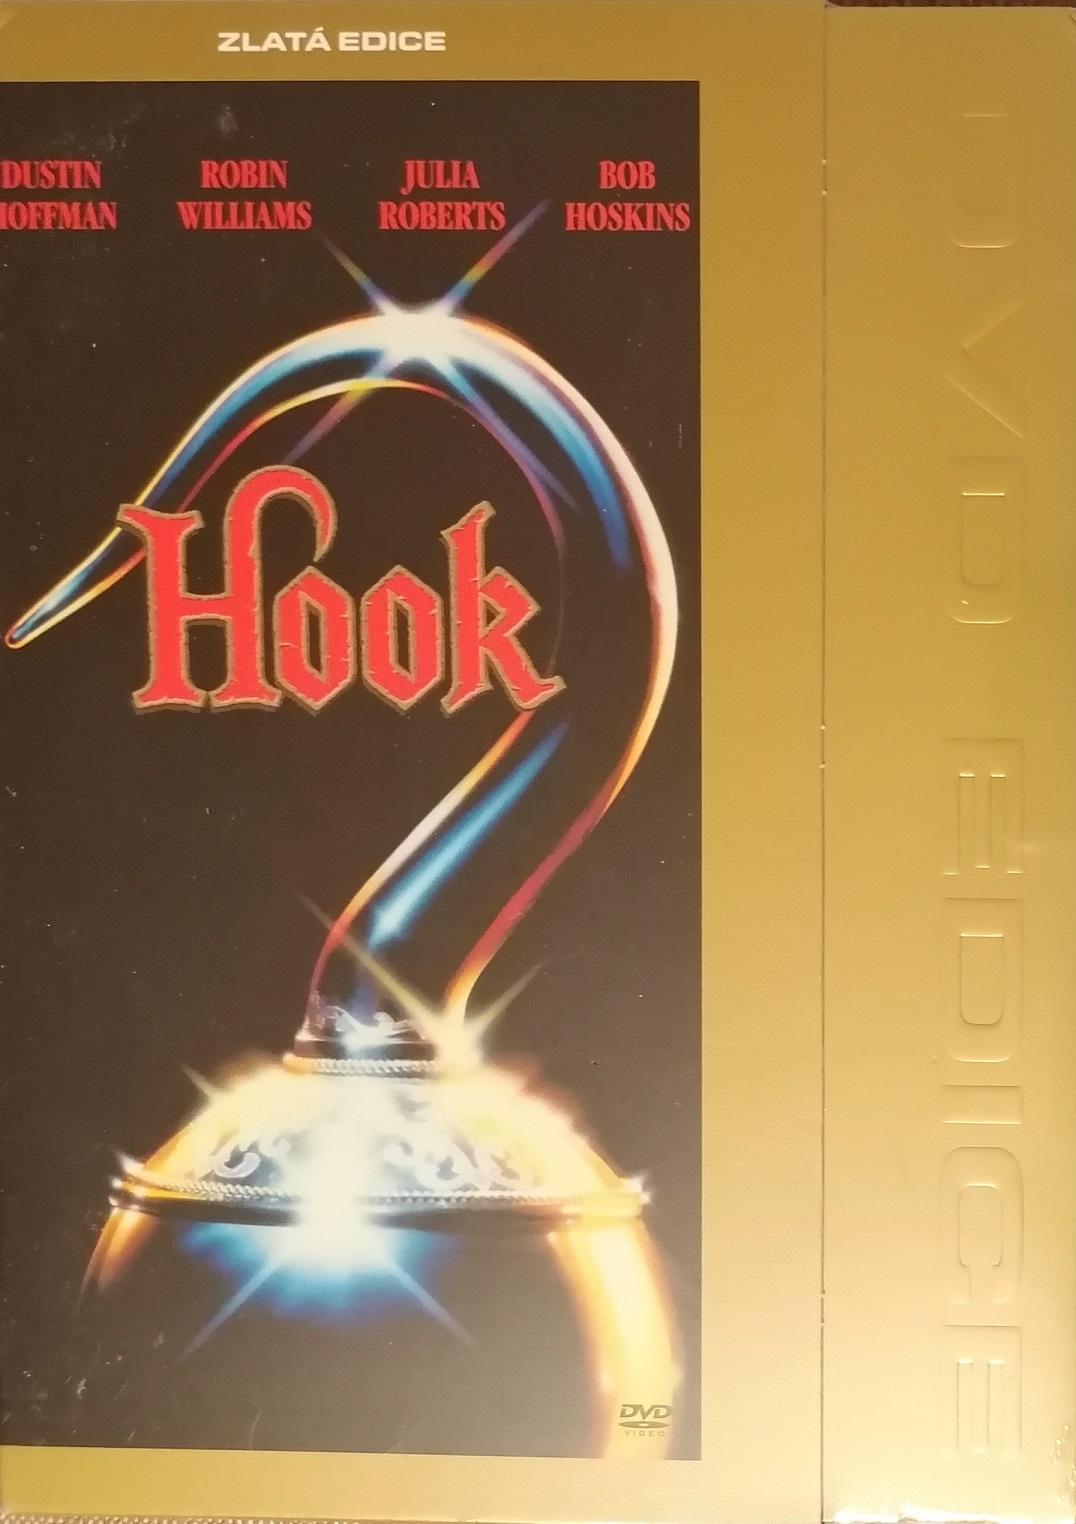 Hook - DVD digipack